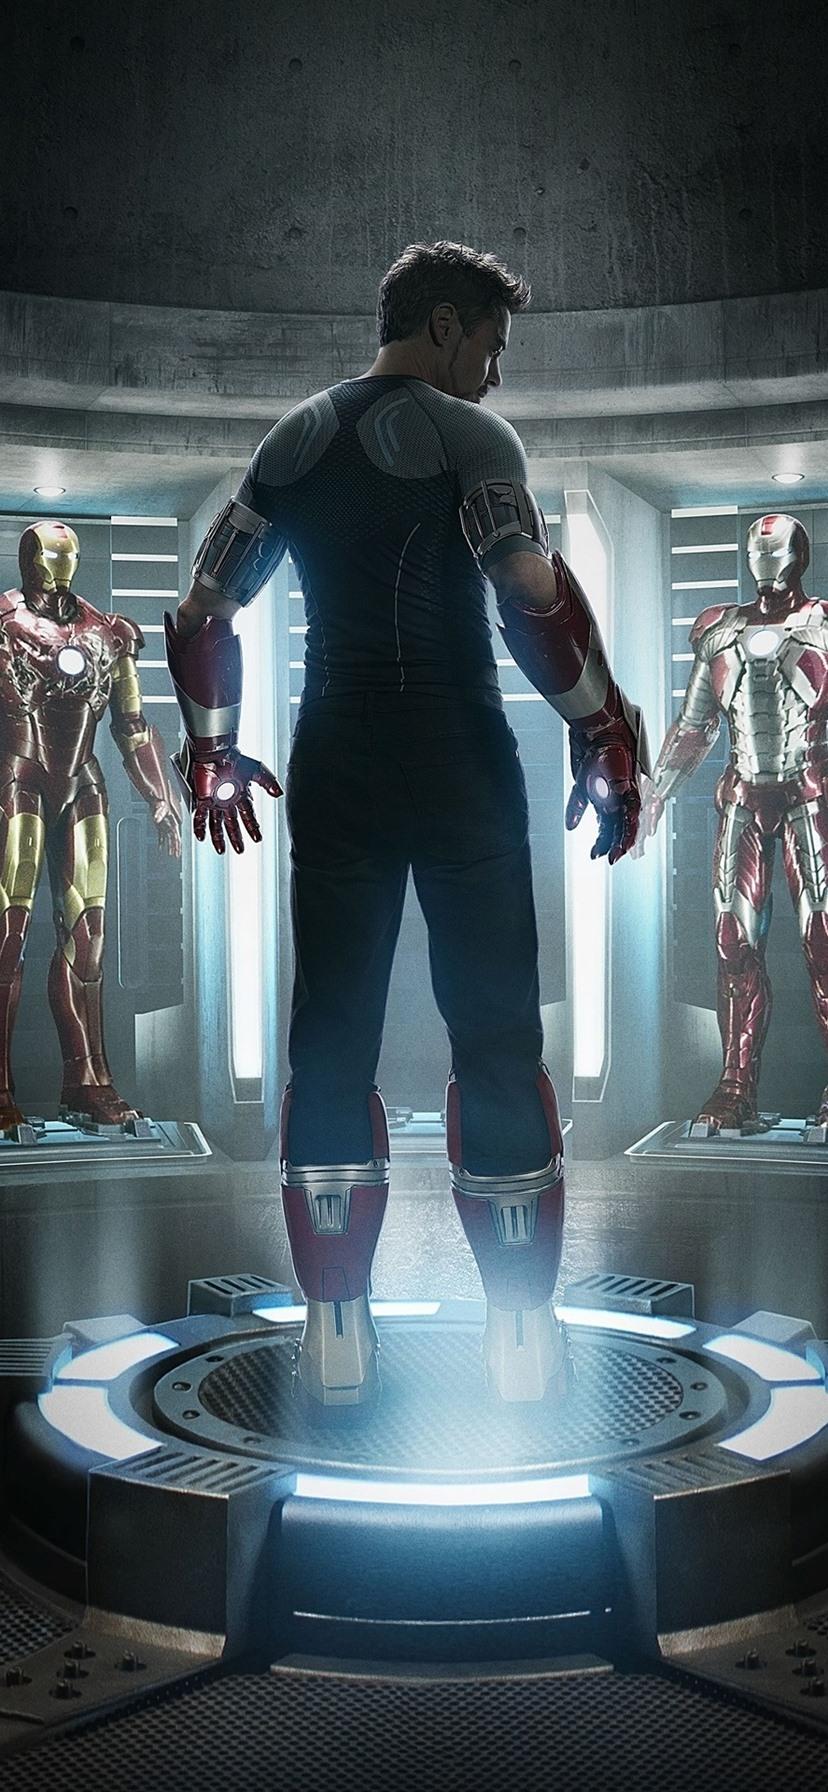 Lego Avengers Endgame Iron Man Hall Of Armor 552343 Hd